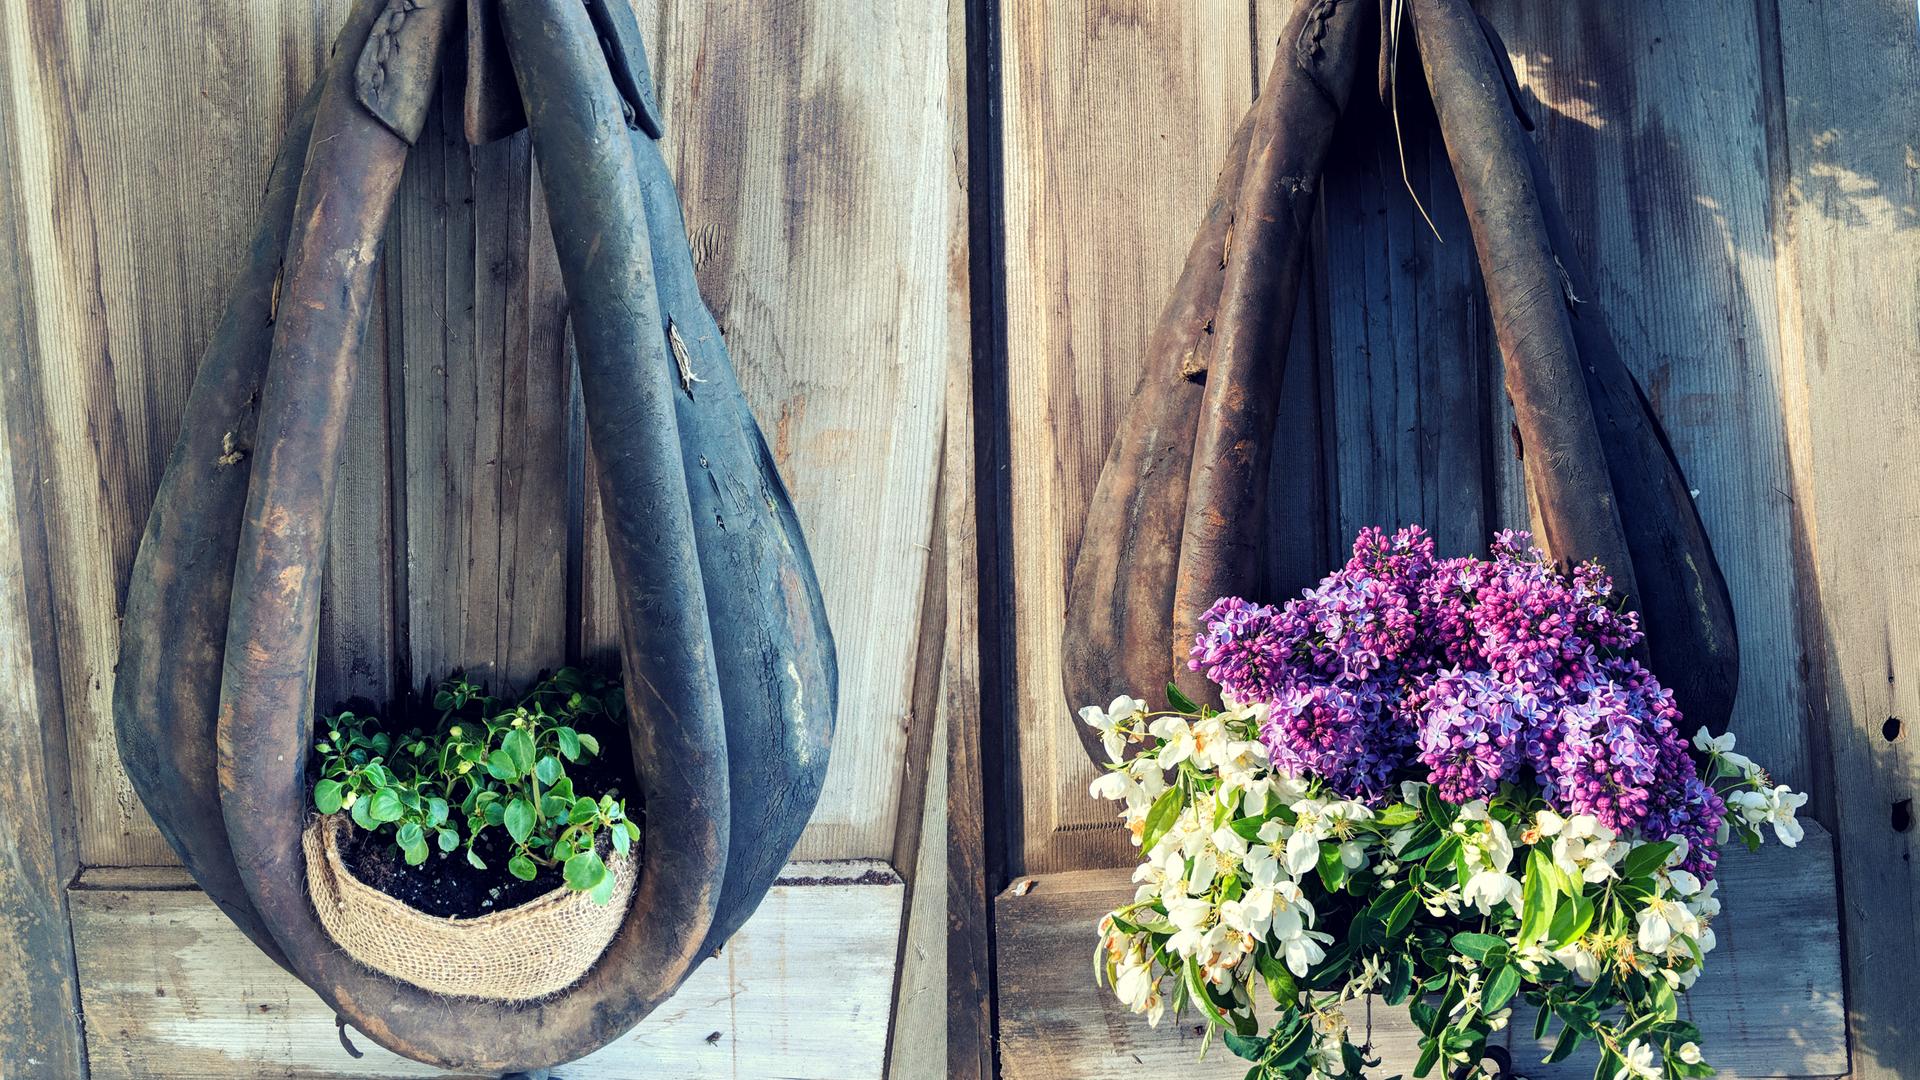 Horse Collar Planter | Rustic and Re-purposed Decor